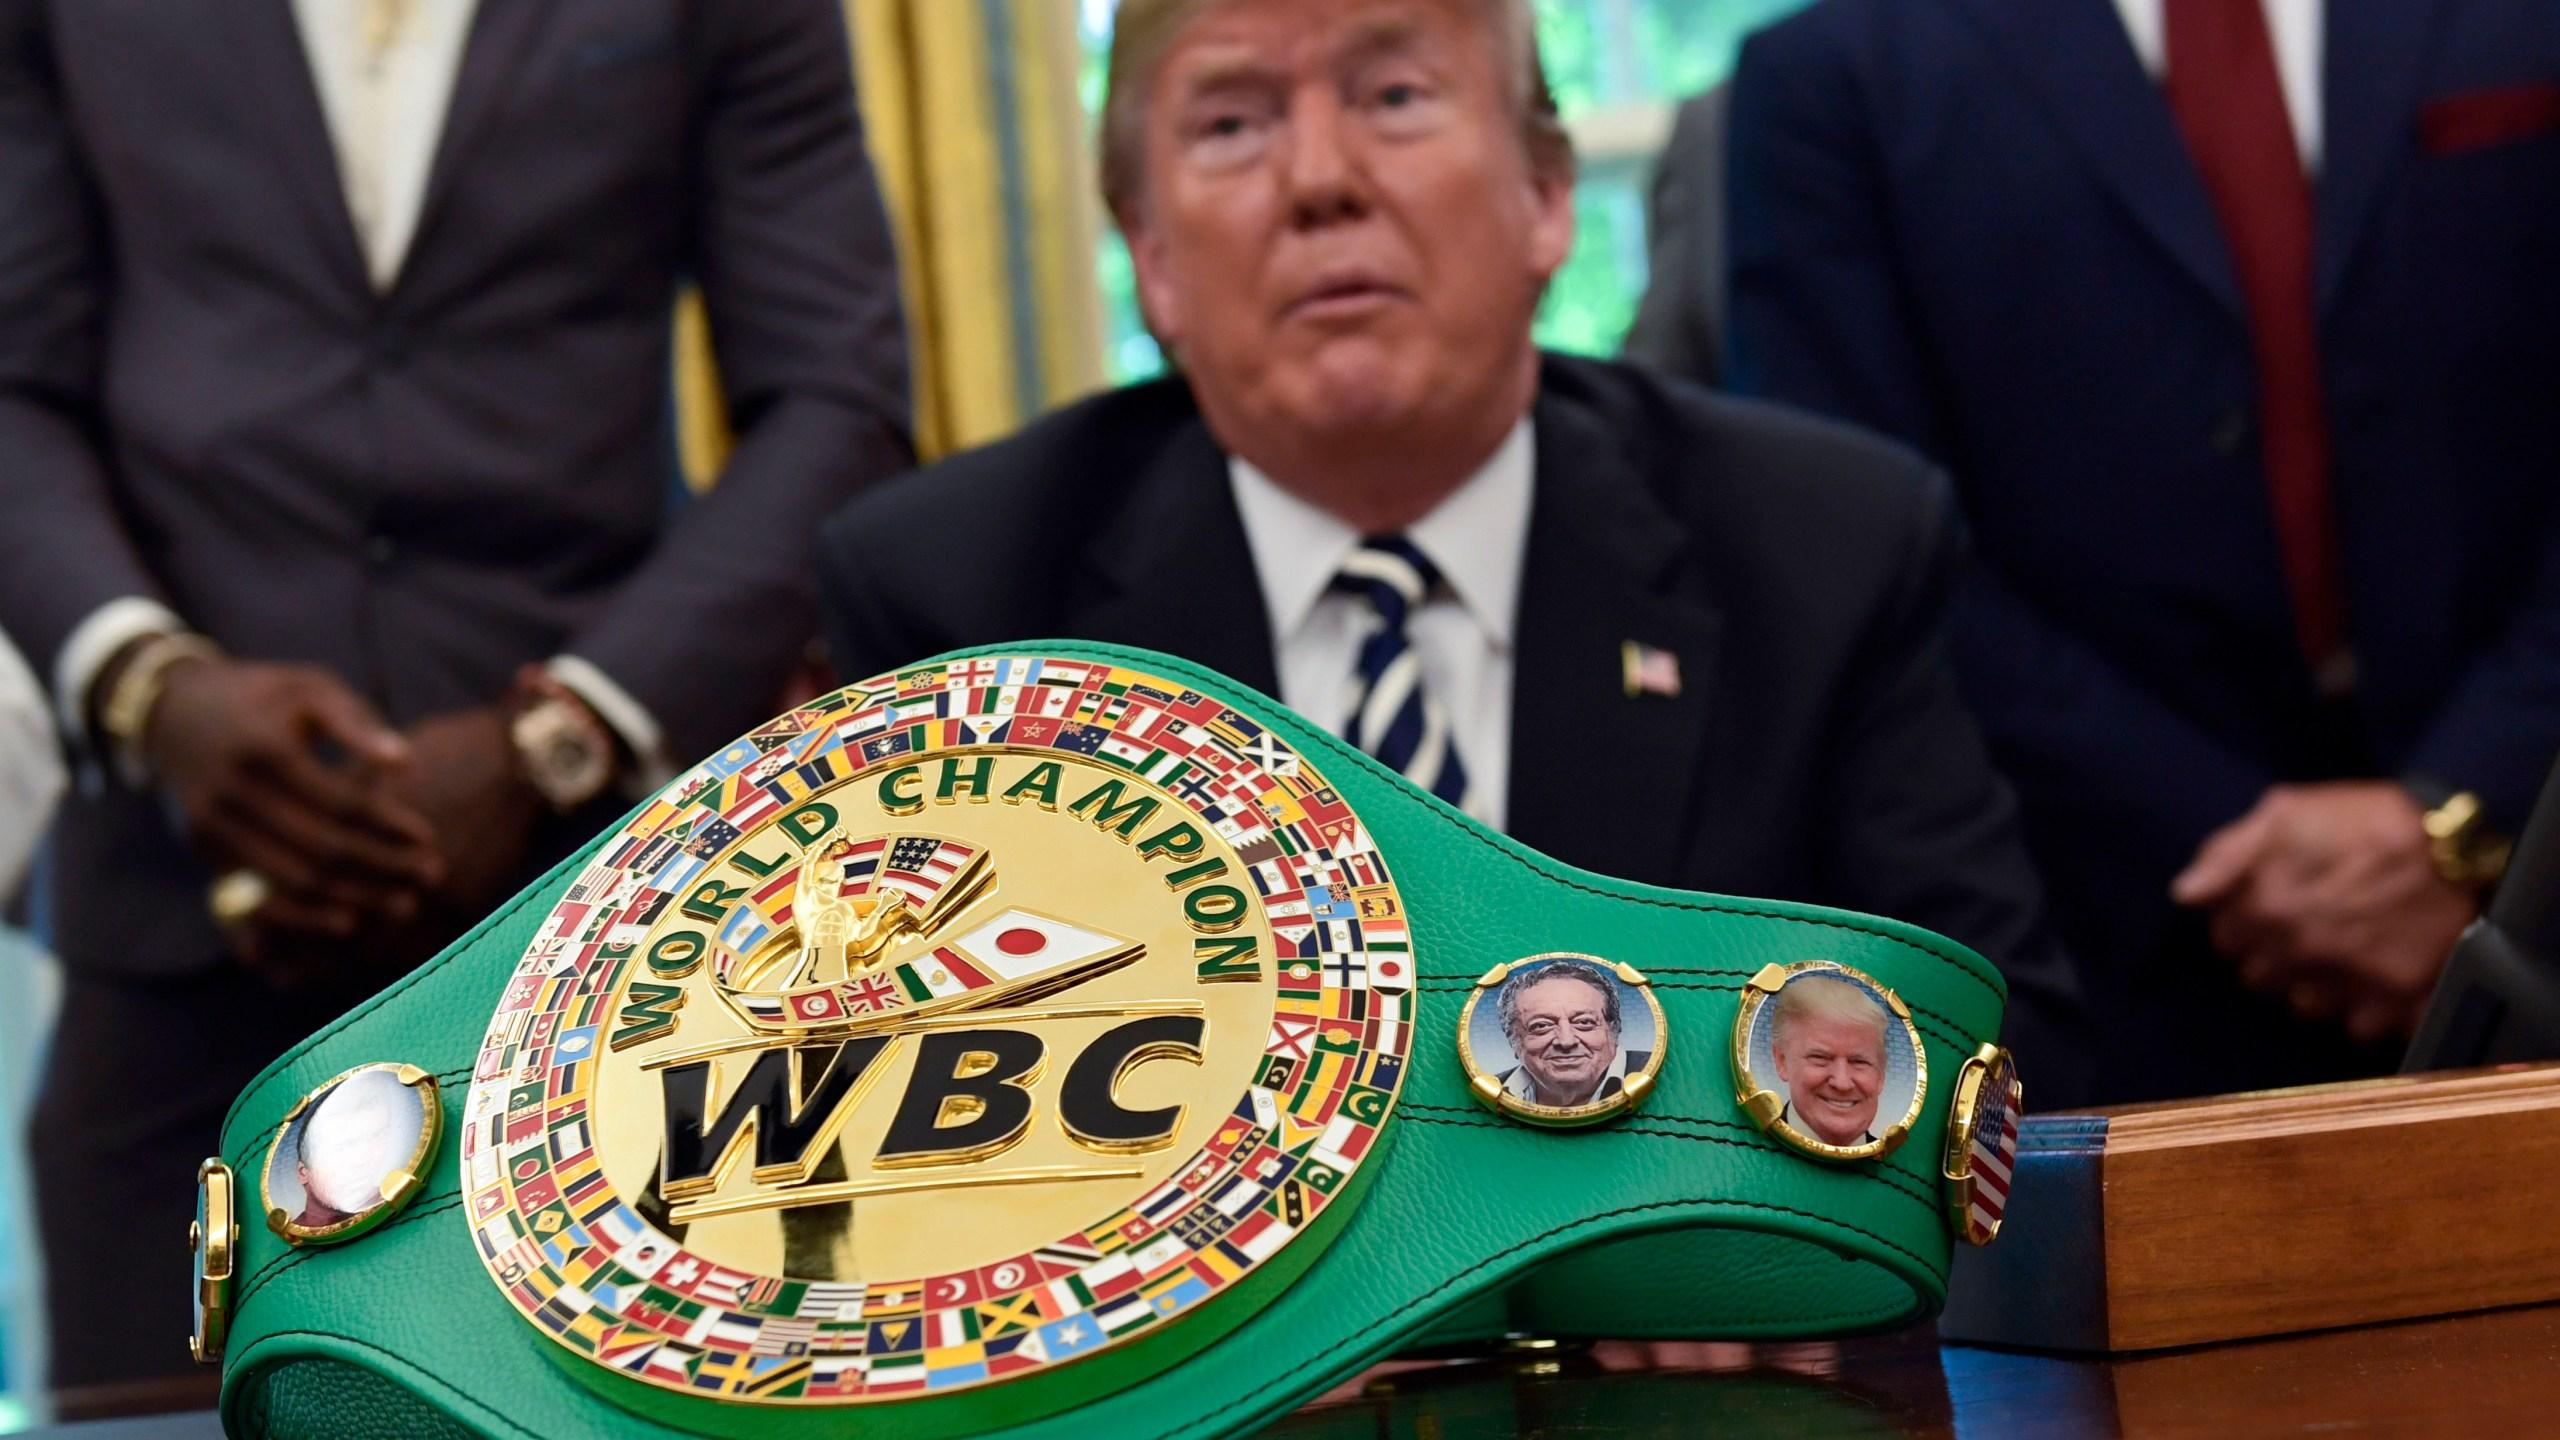 Trump_Boxer_Pardon_01668-159532.jpg32824903